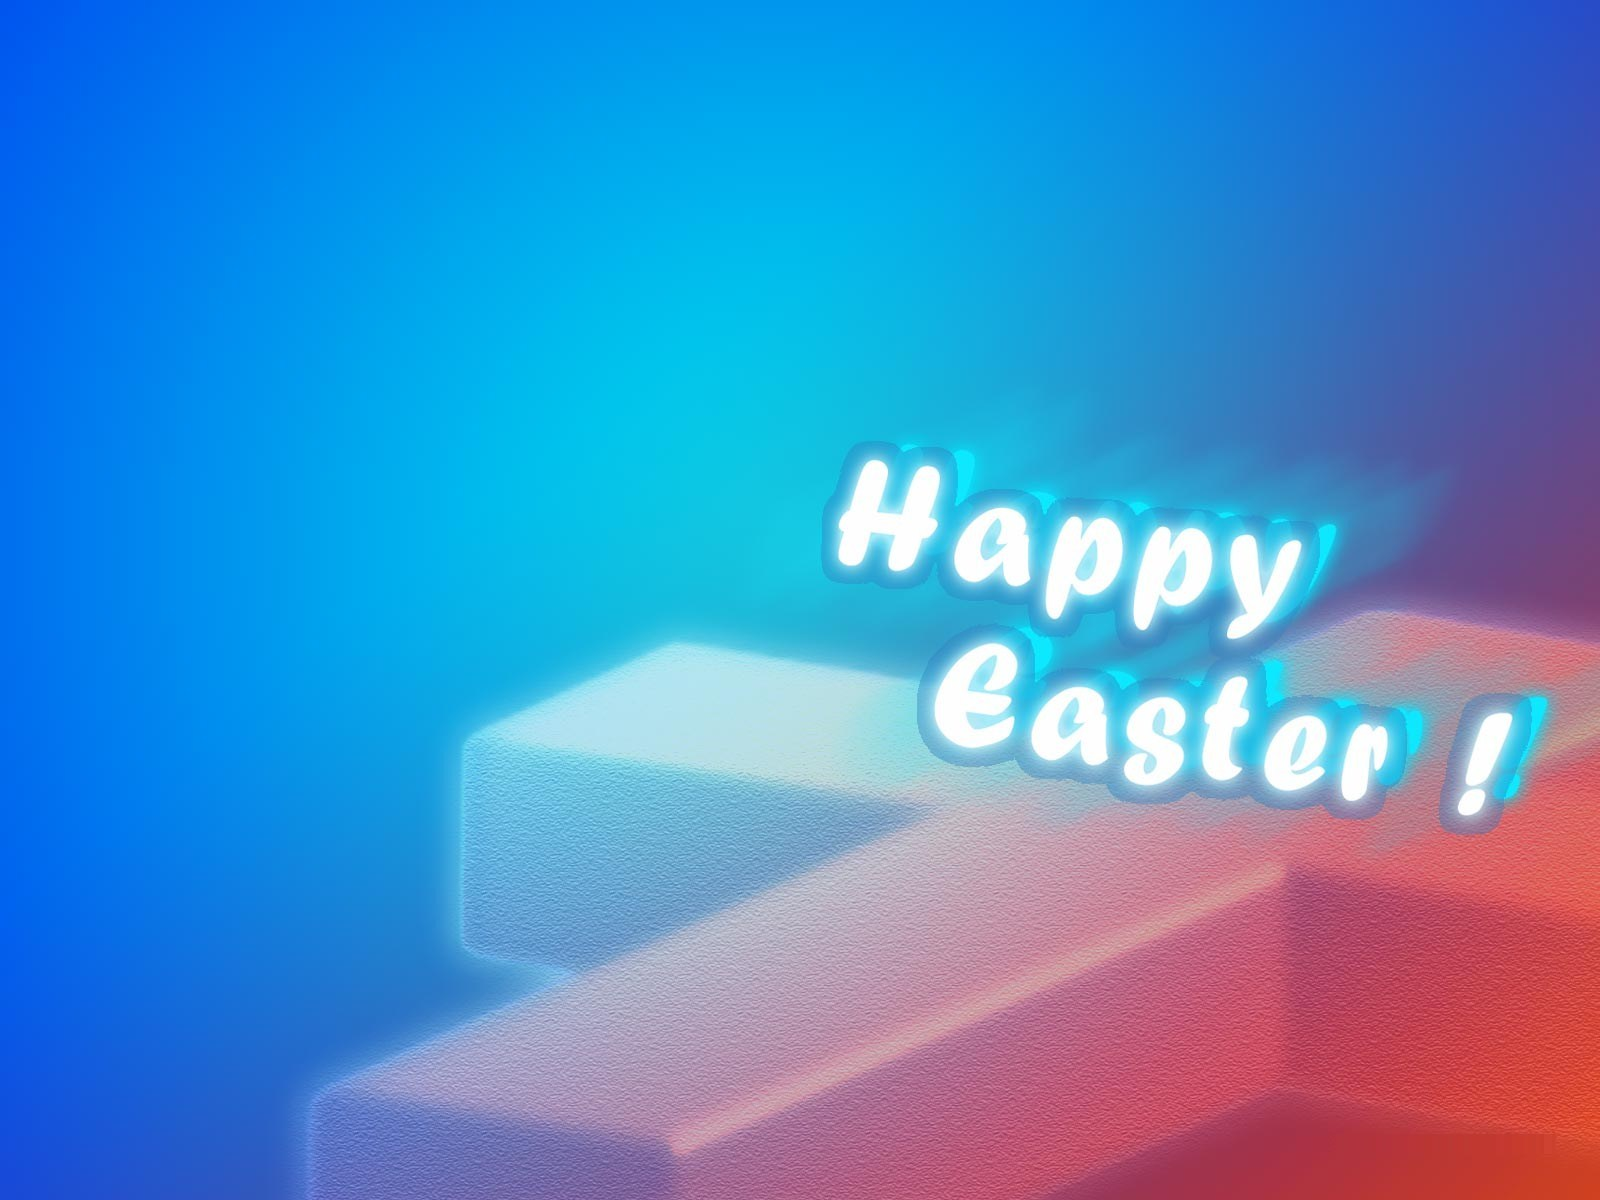 http://www.turnbacktogod.com/wp-content/uploads/2011/04/Easter-Wallpaper-Background-15.jpg